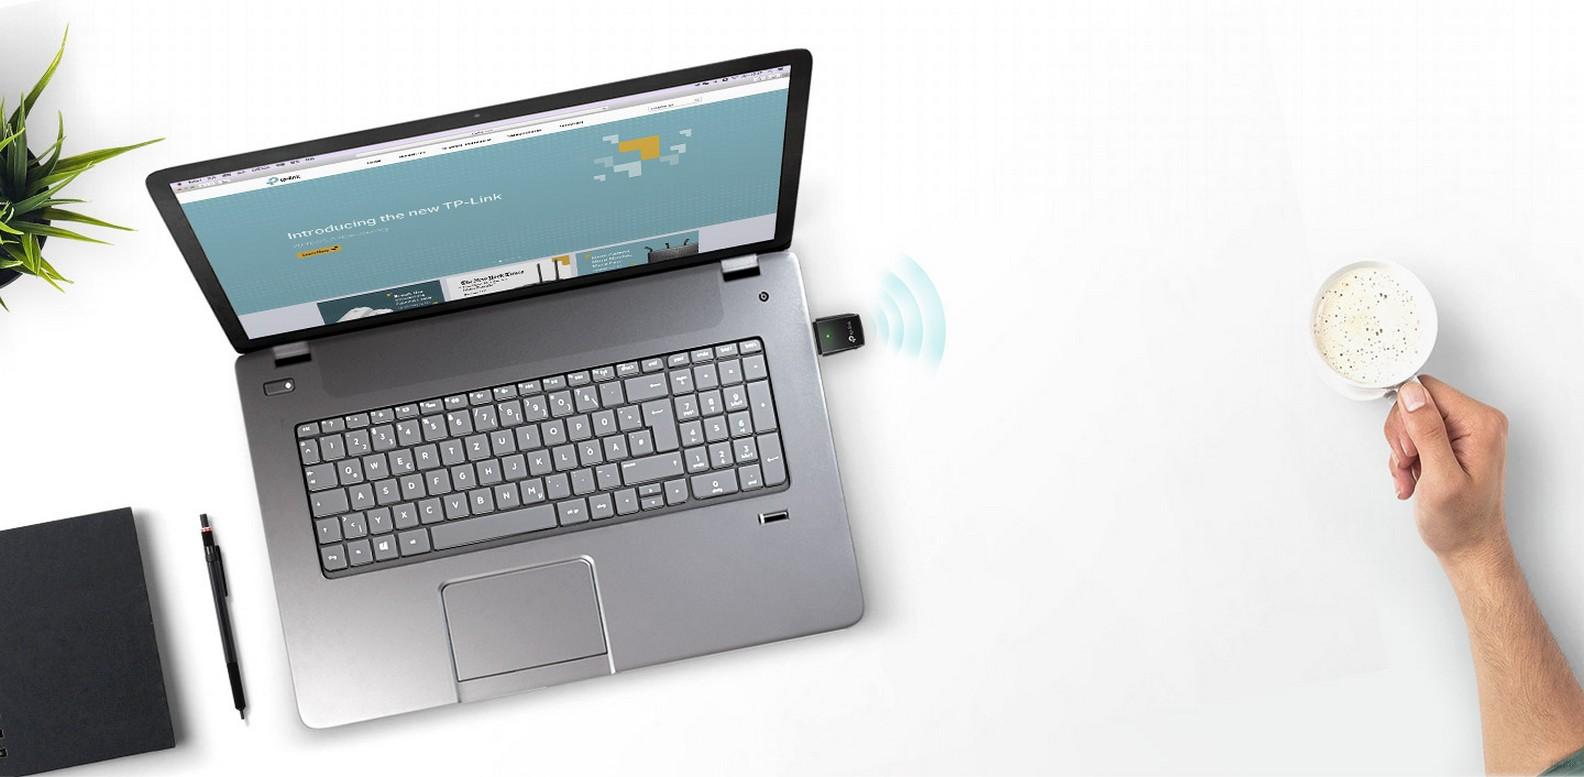 Обзор двухдиапазонного Wi-Fi адаптера TP-Link Archer T2U AC600